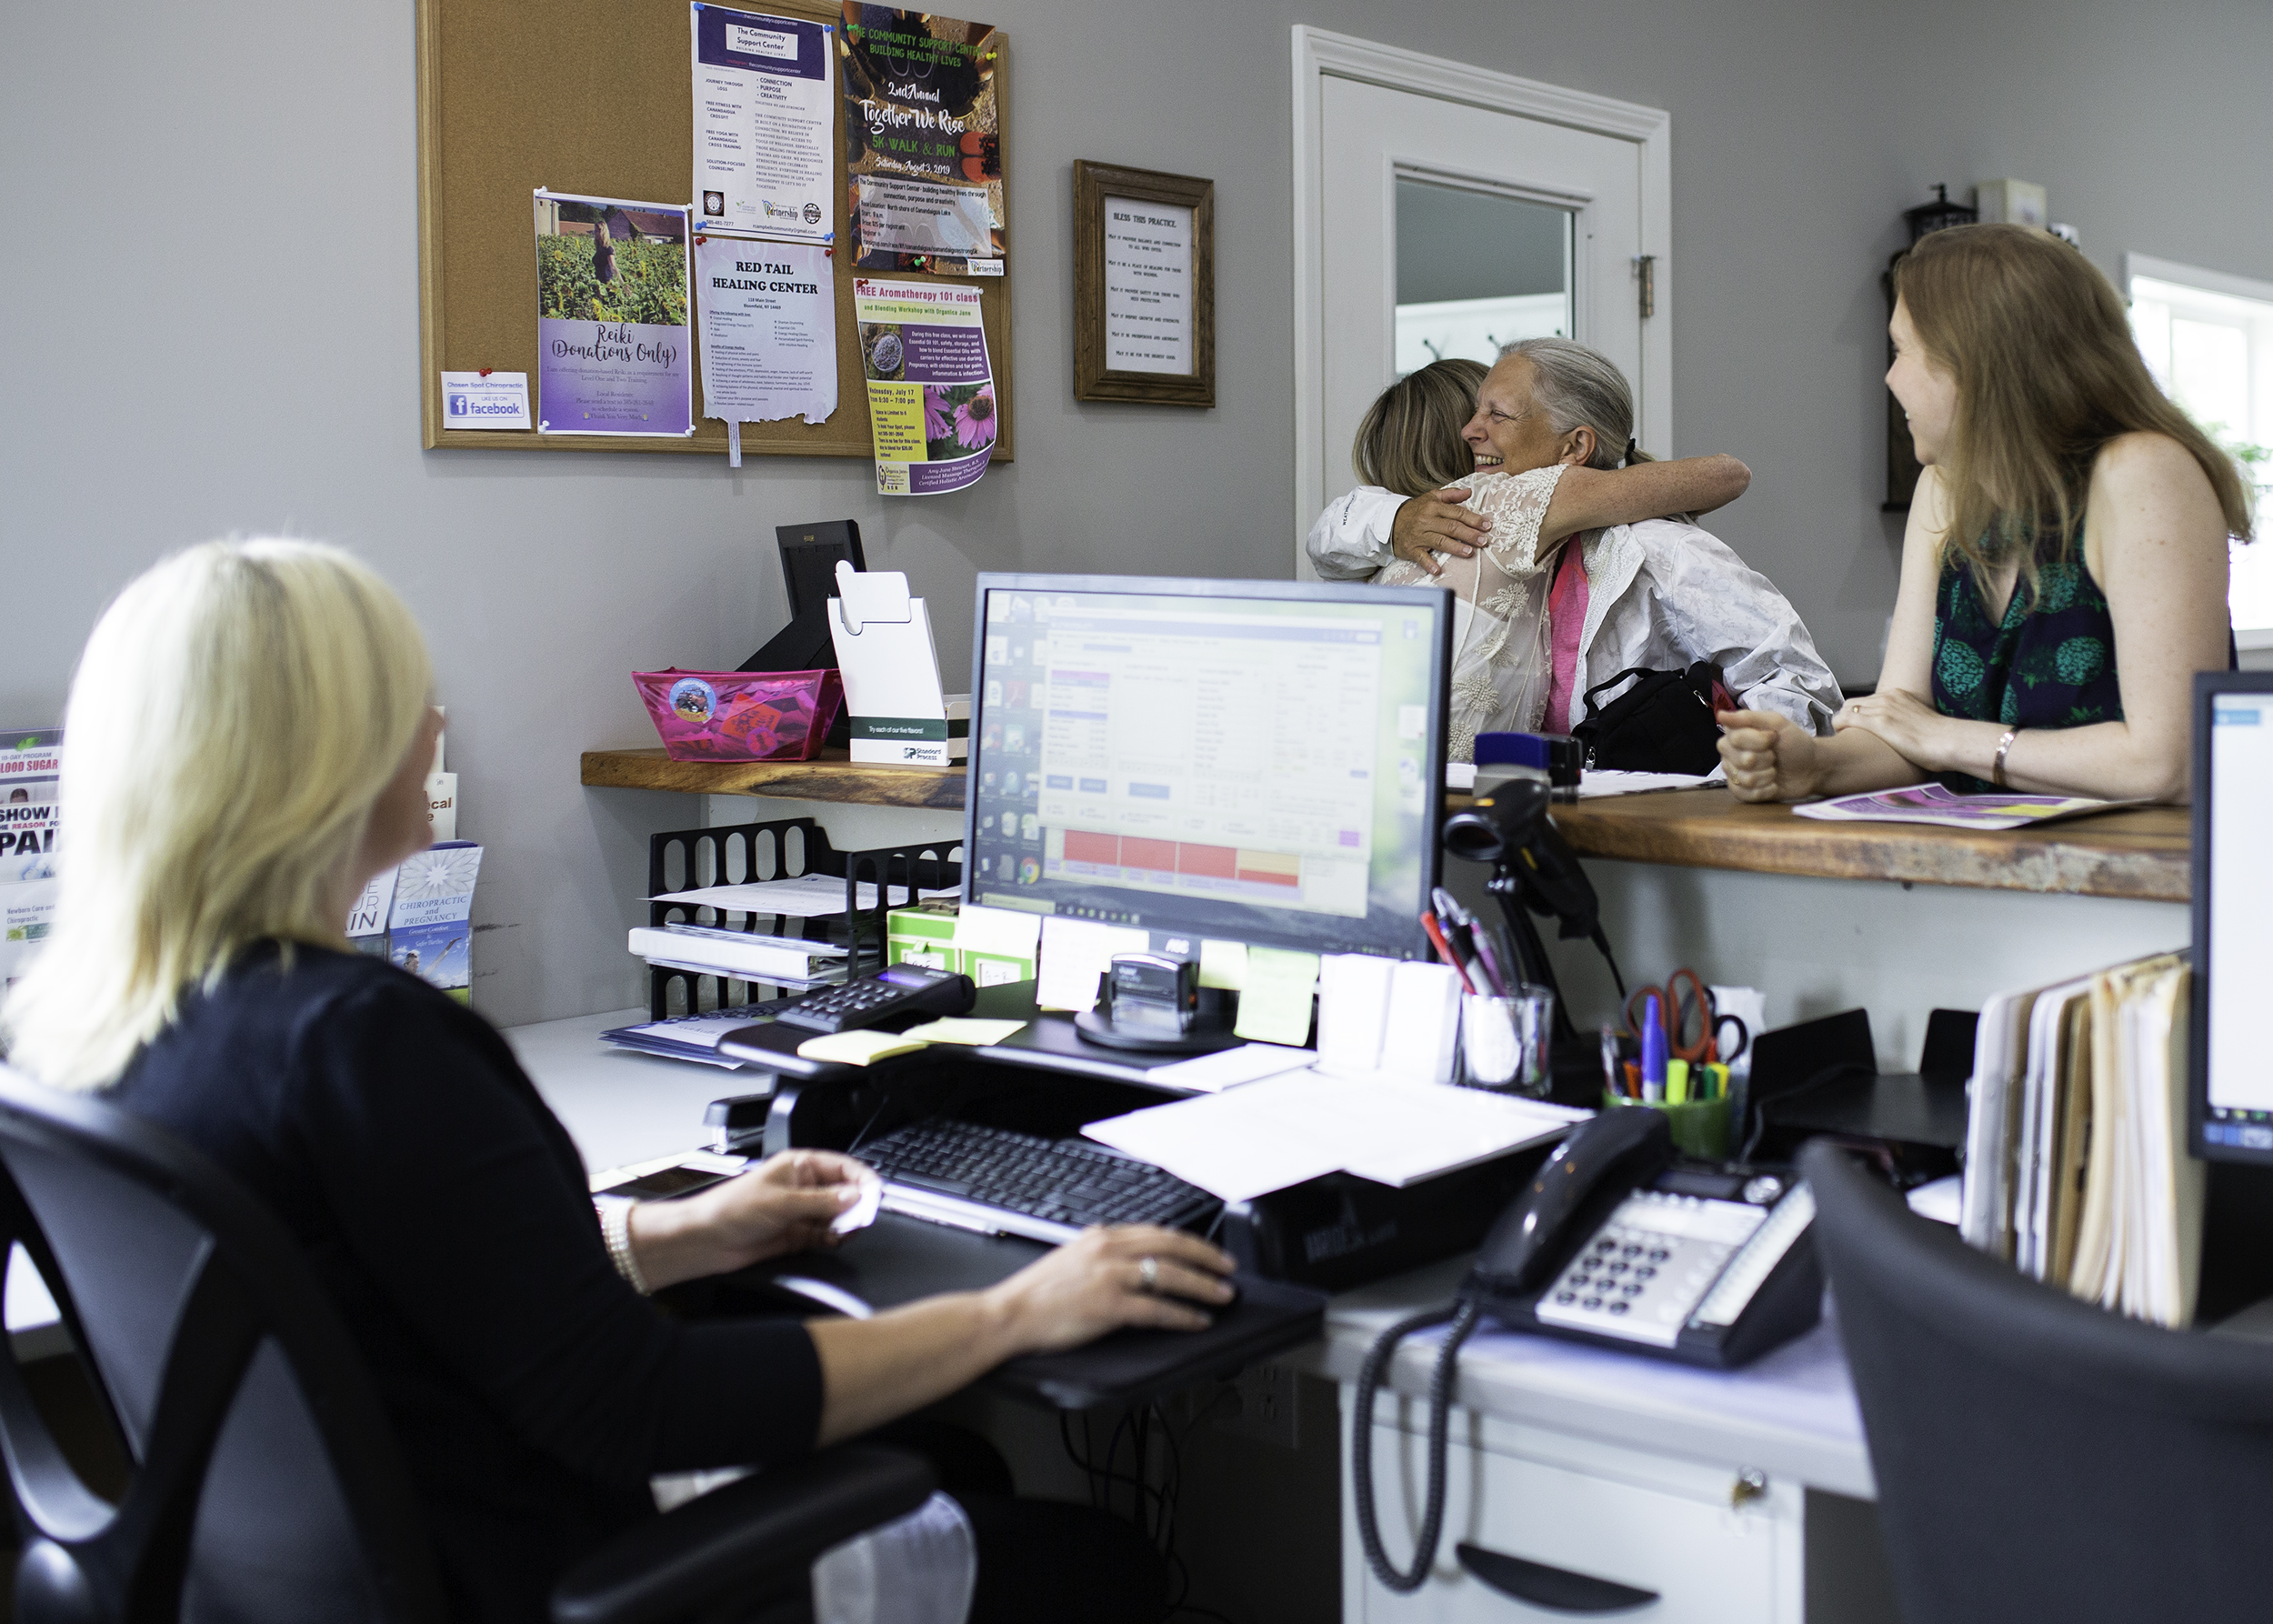 patient-hugs-chiropractor-documentary-business-photographer-canandaigua-new-york-erin-cunningham.jpg